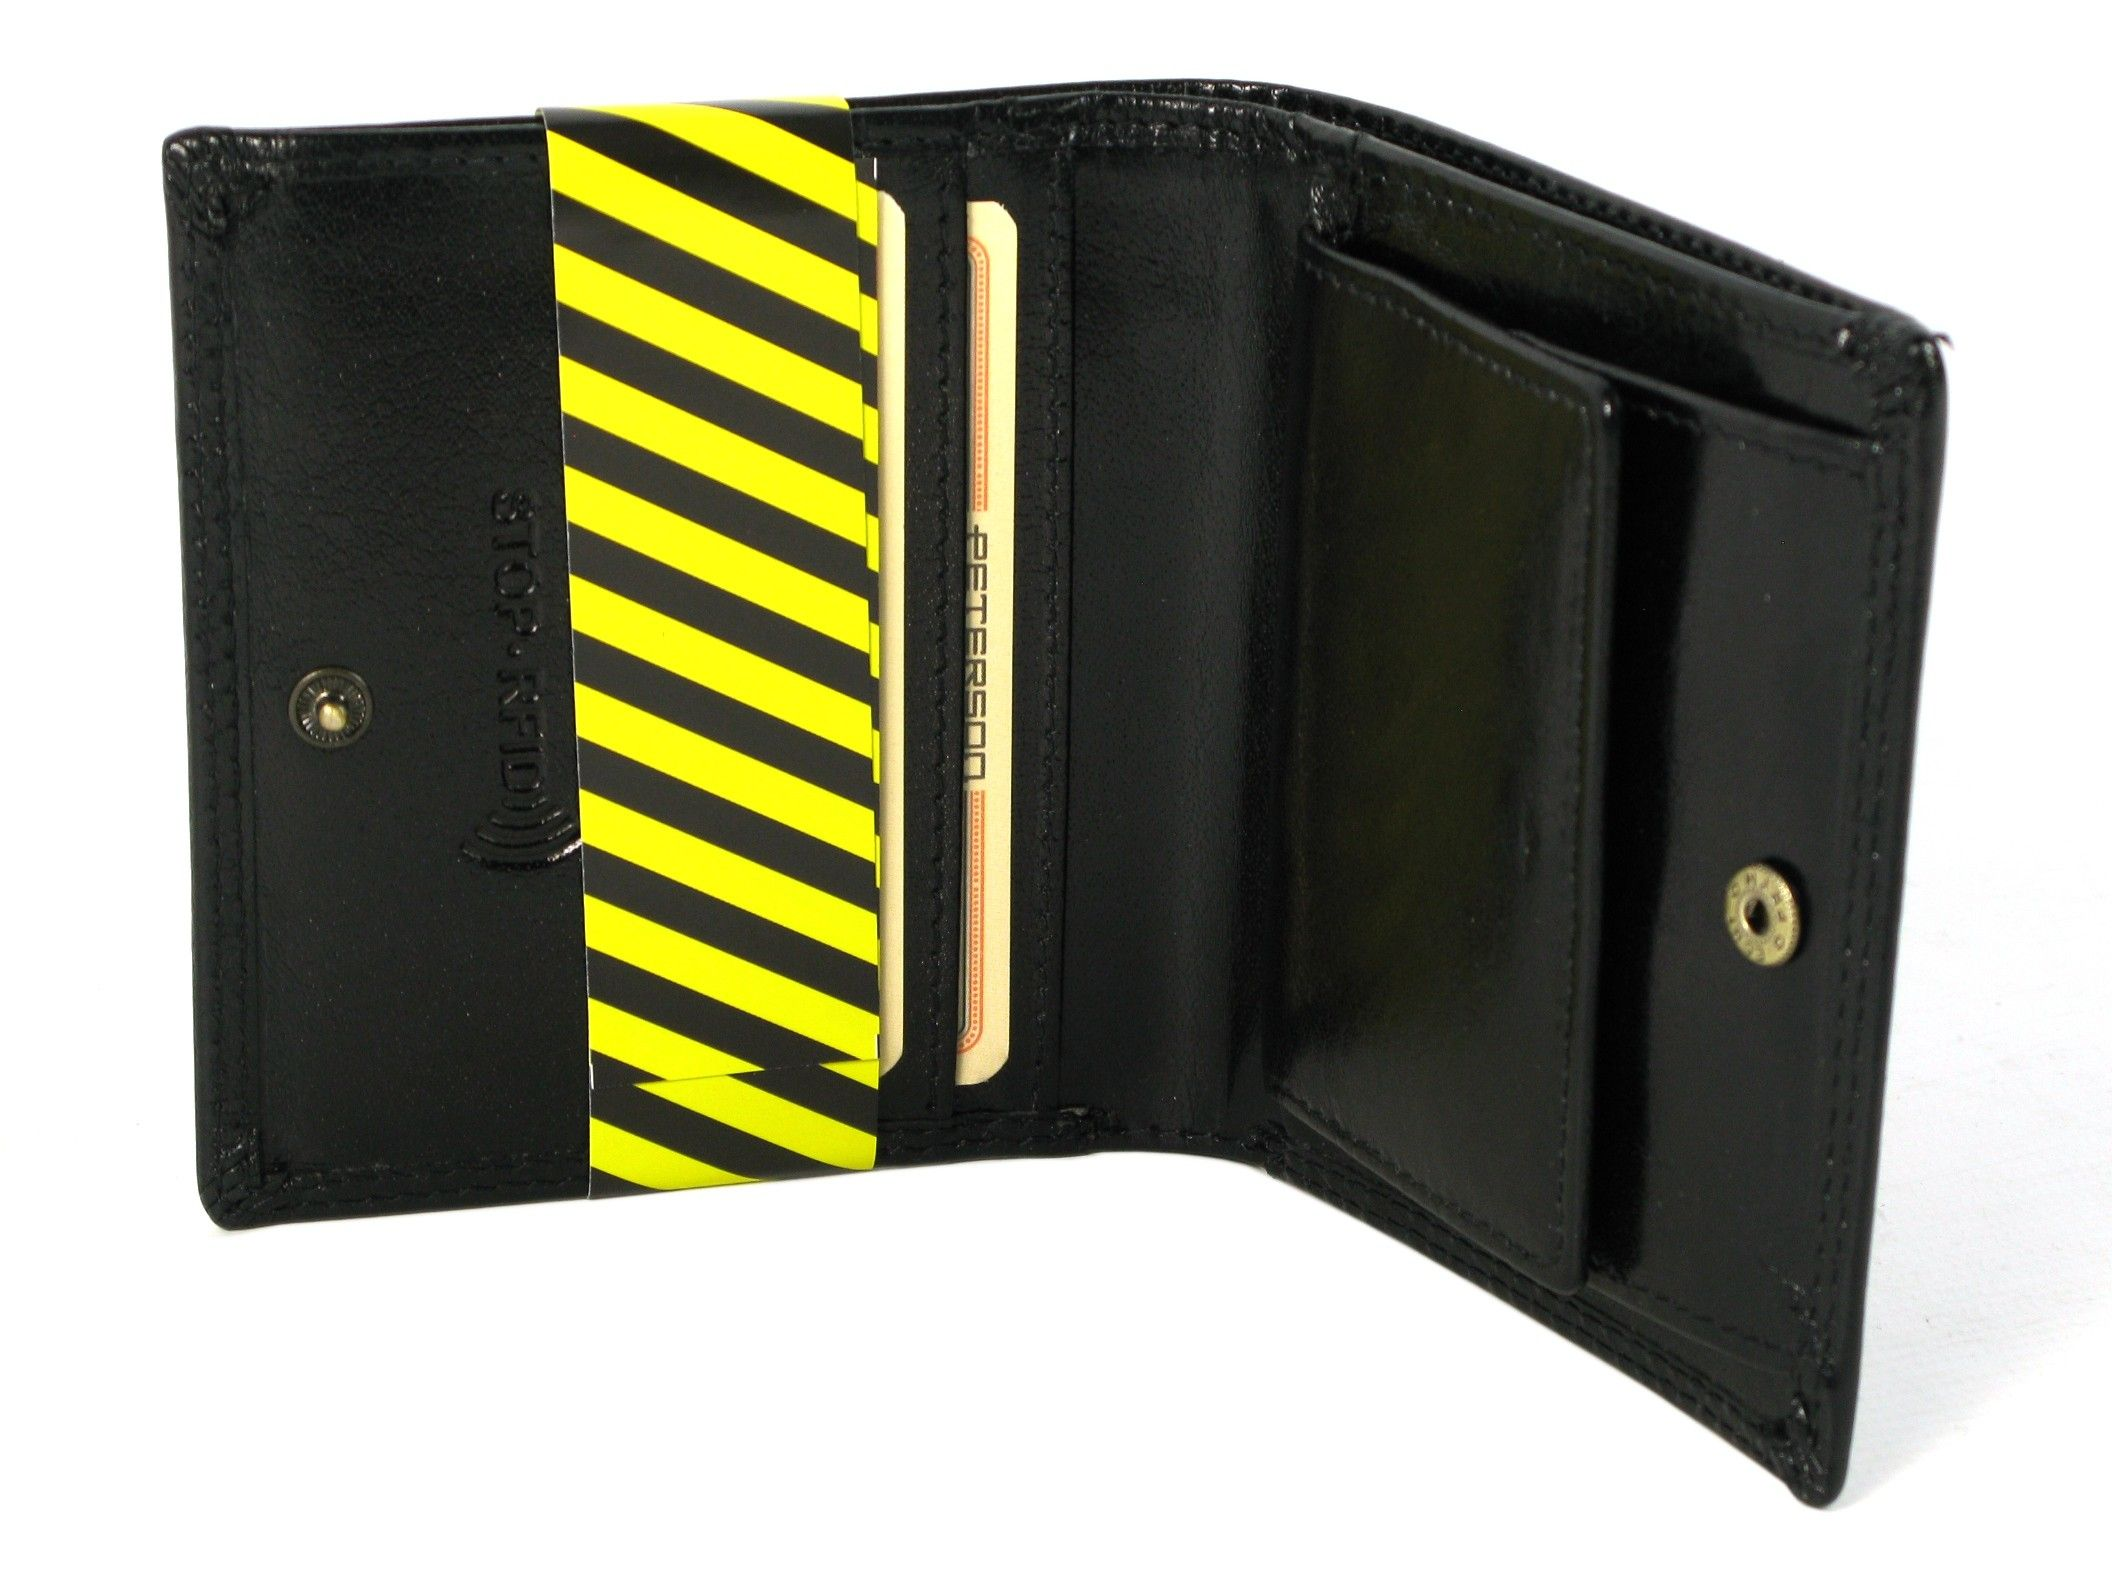 facbf3b2dda06 Portfel męski skórzany PETERSON RW377-1 RFID | Akcesoria skórzane ...